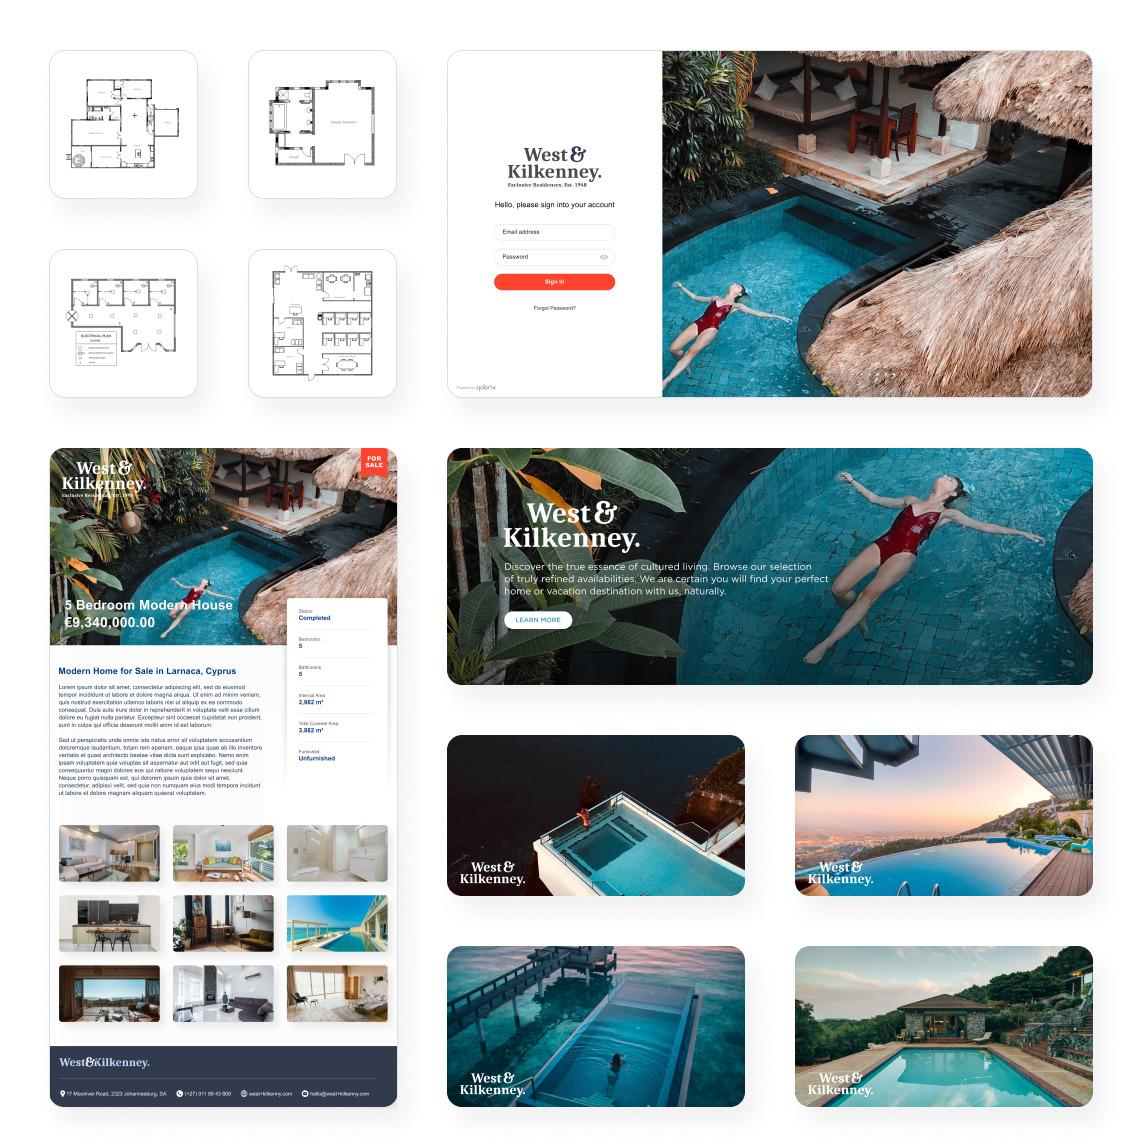 Real Estate Agent portal Marketing material